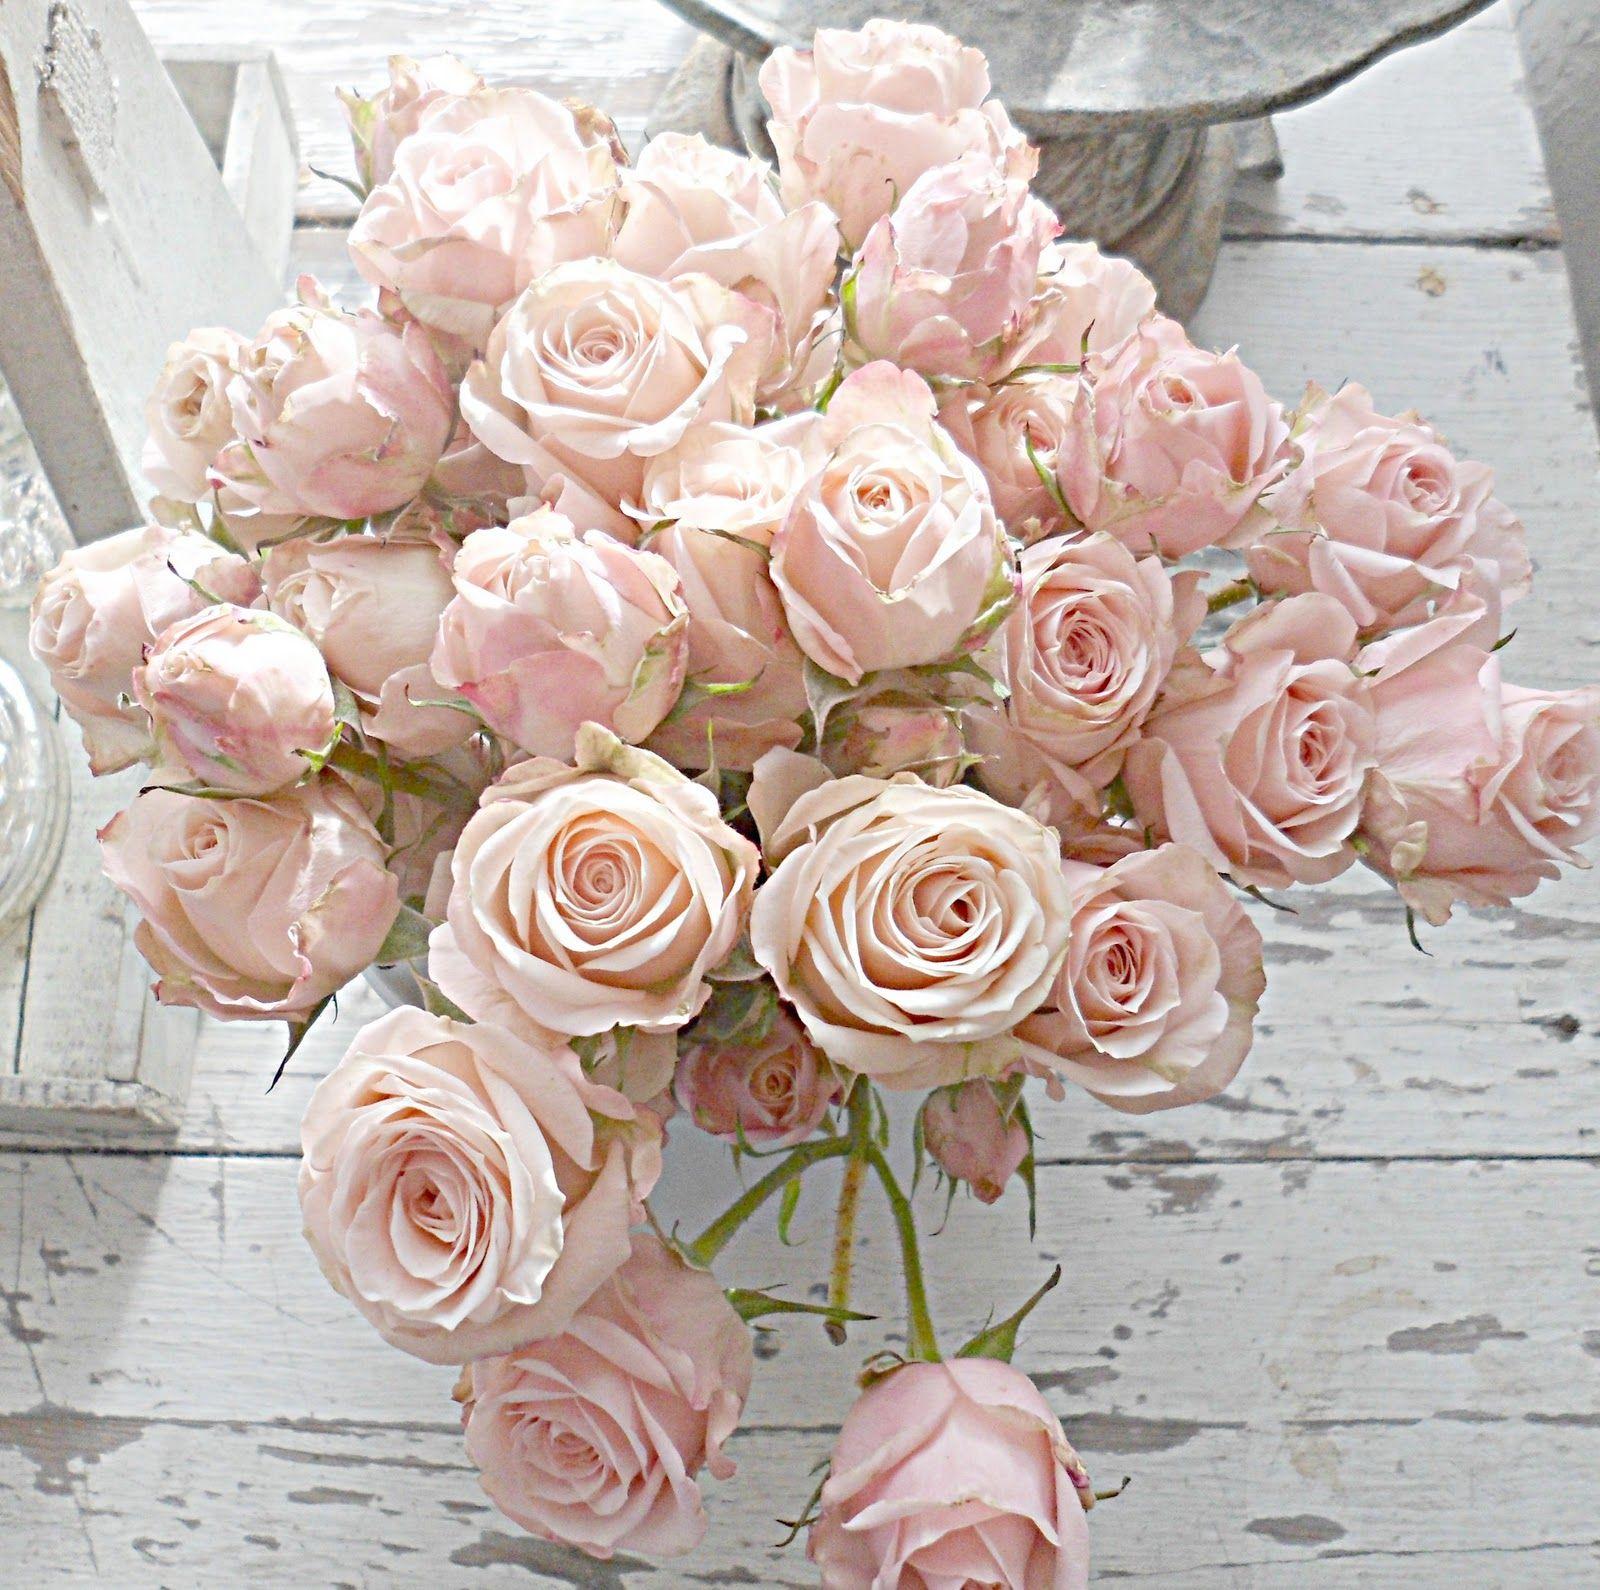 Shabby Und Mehr: Flowers, Peonies, Roses